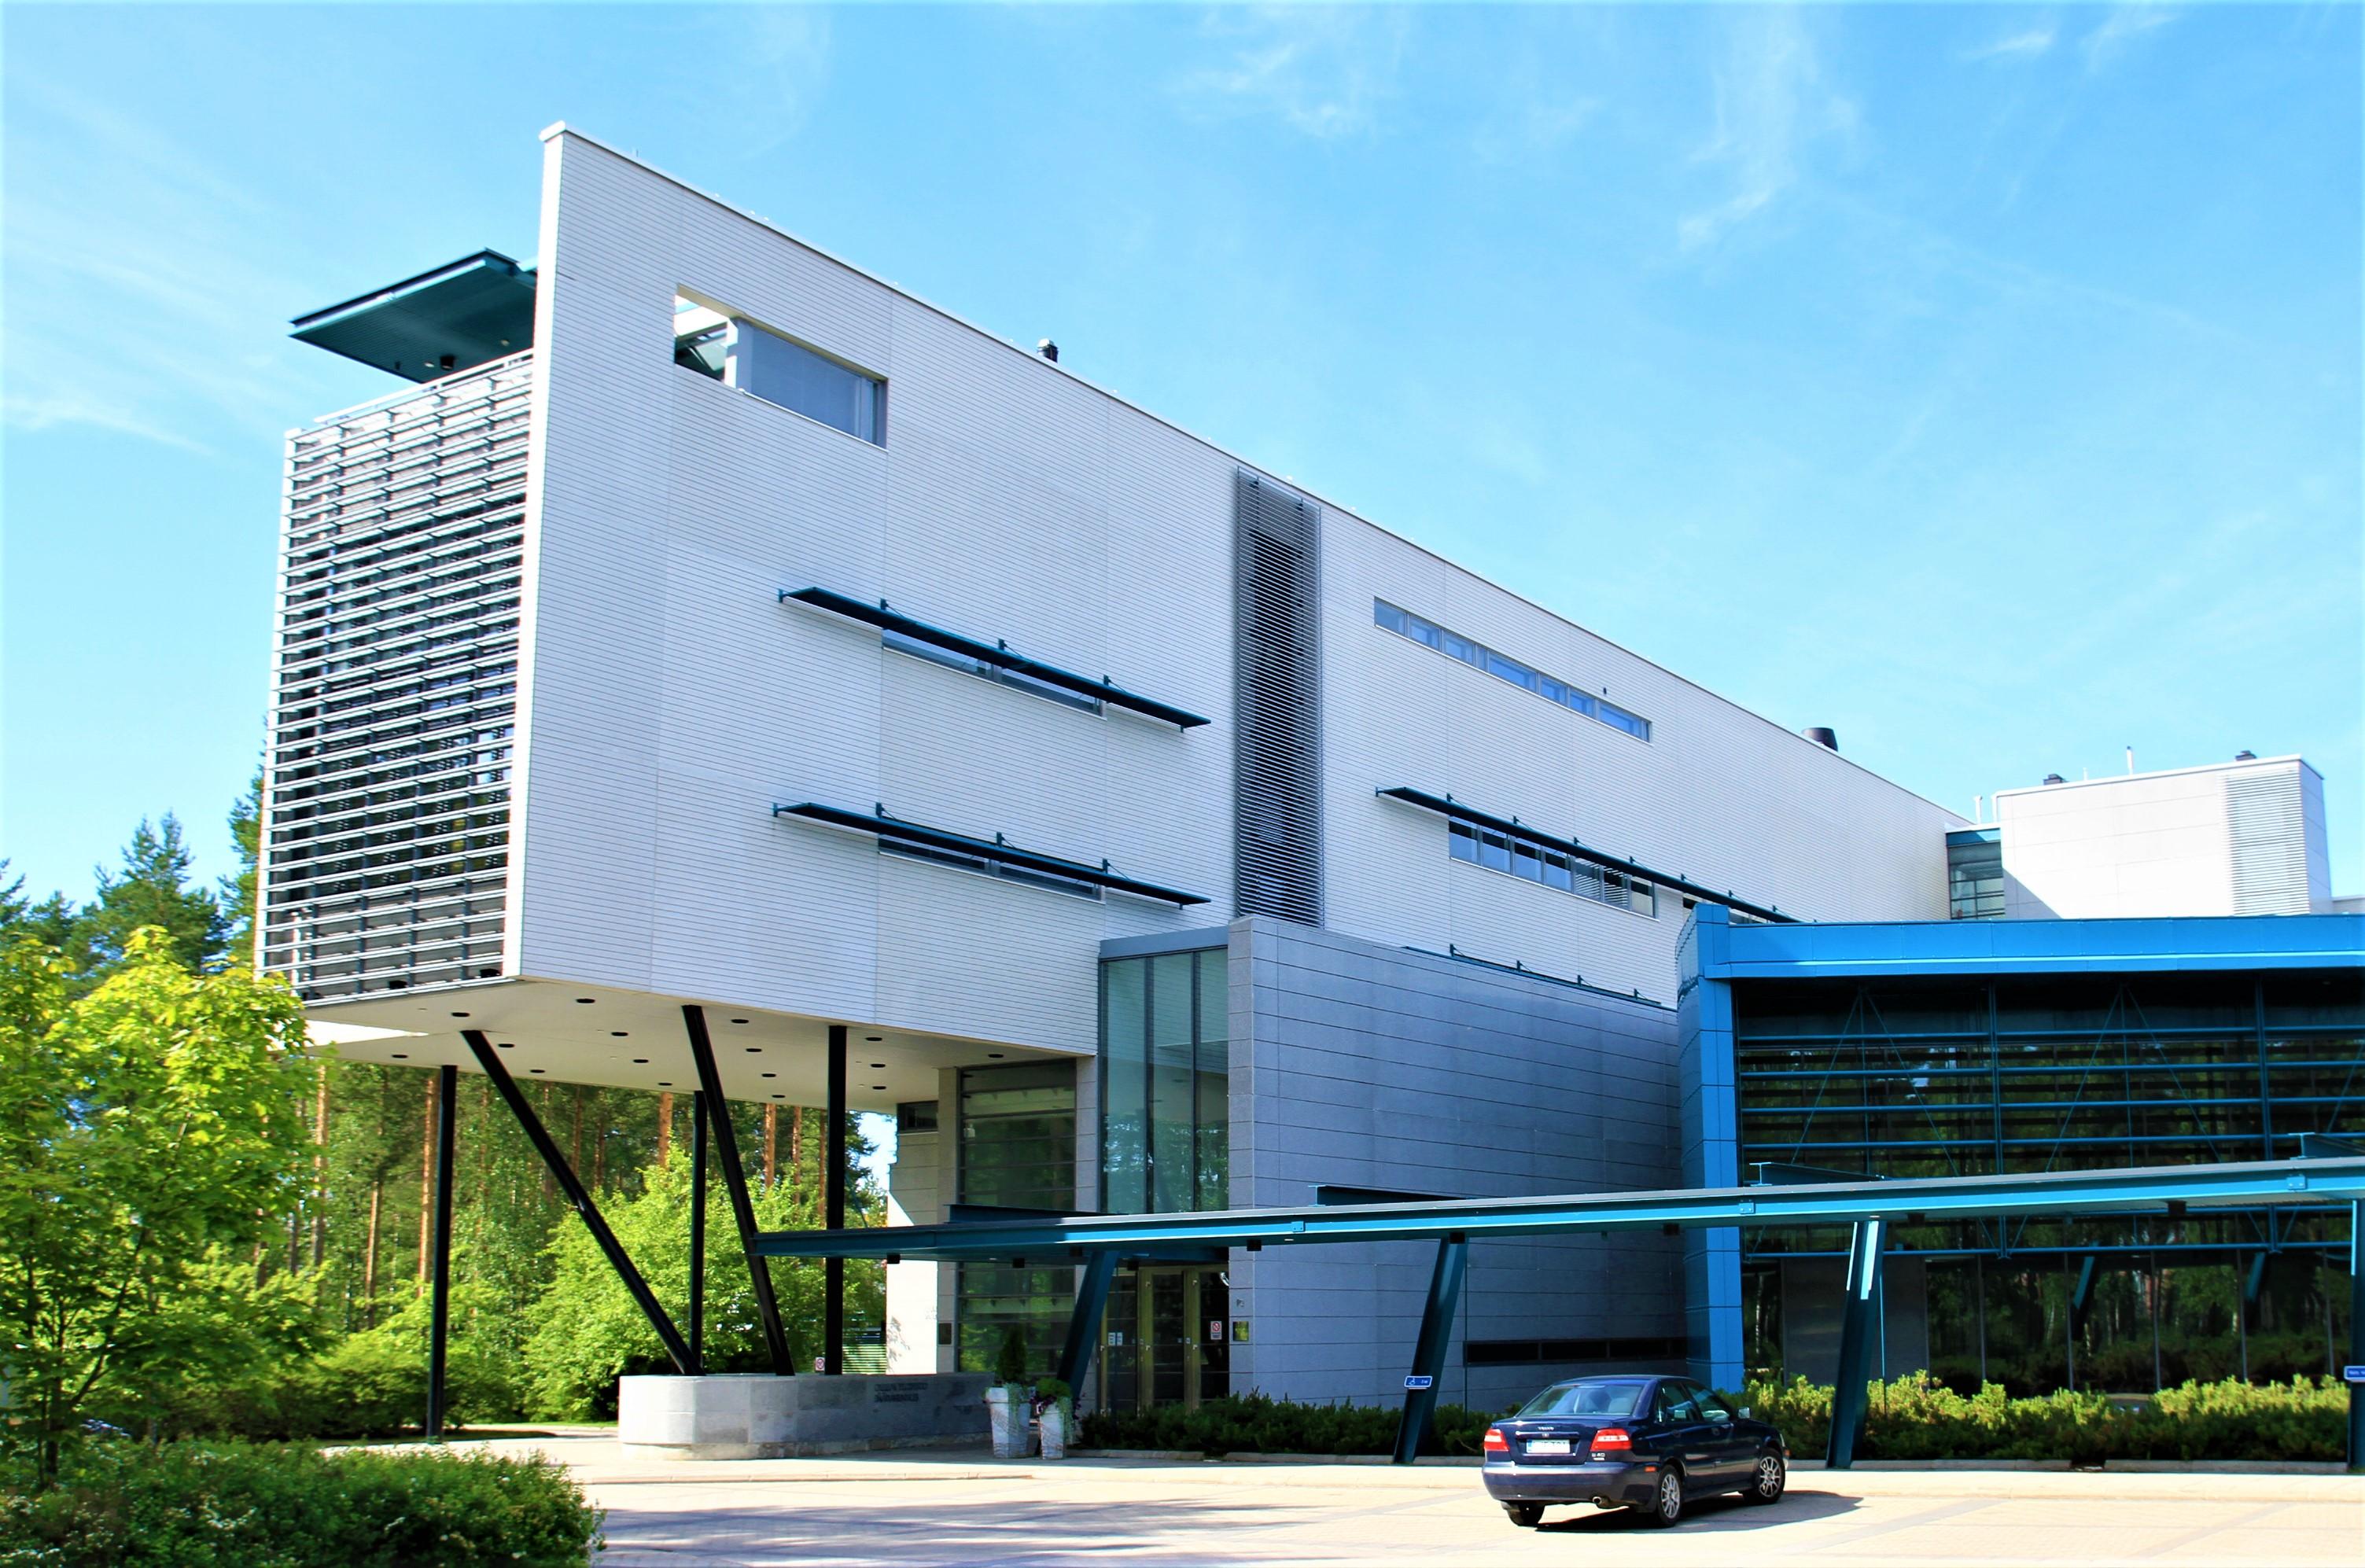 Oulu University Geological Museum